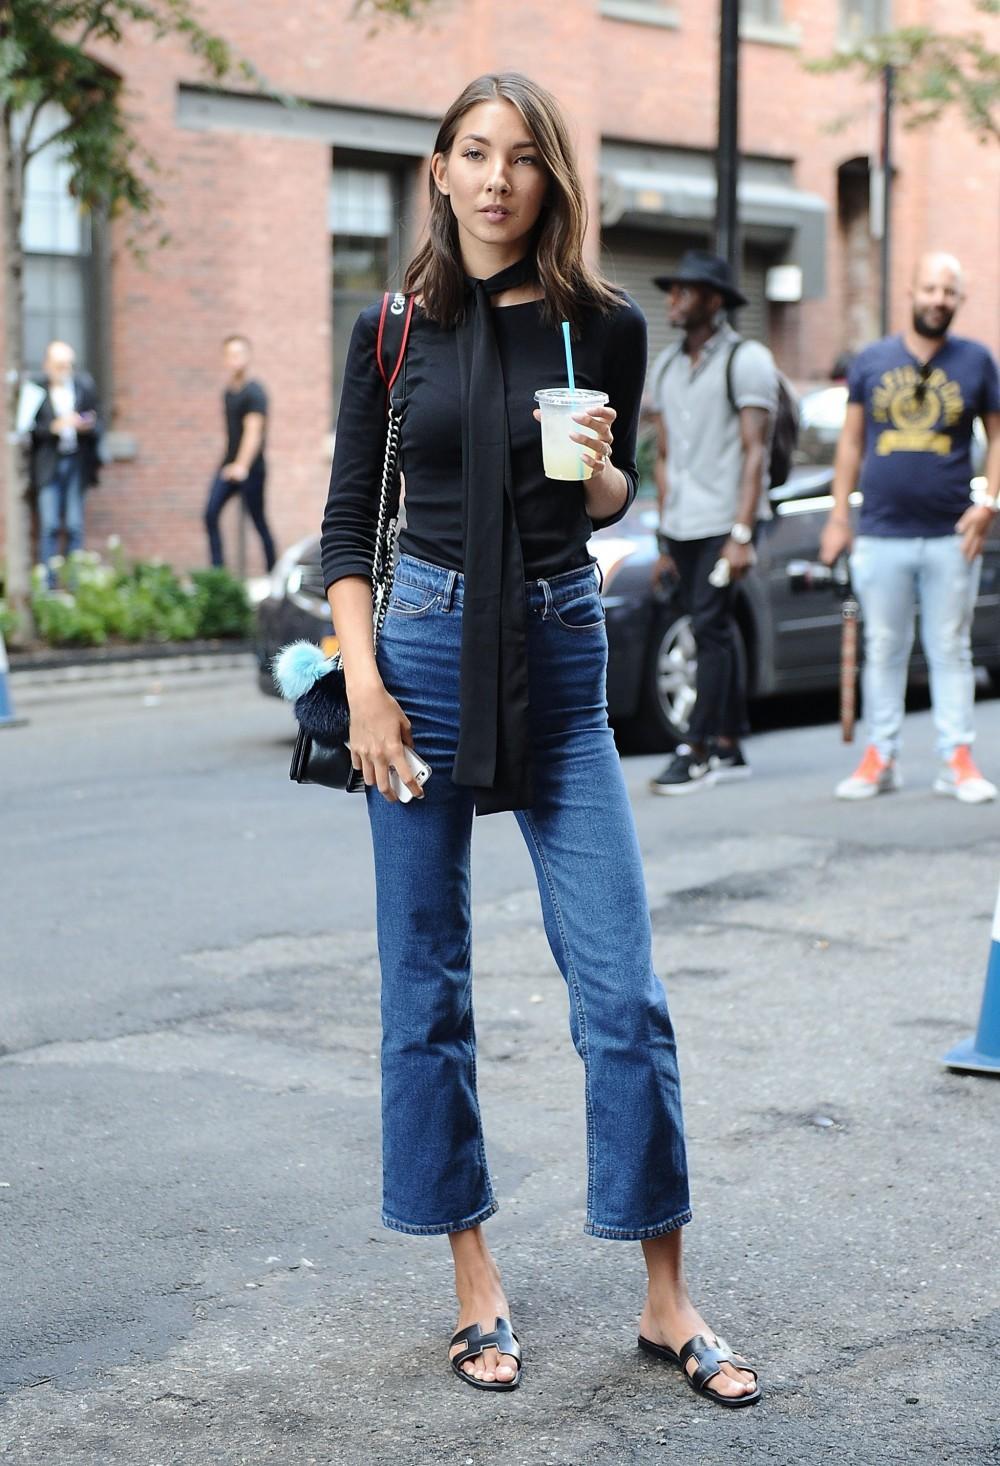 fotograaf-tijdens-new-york-fashion-week-lente-zomer-2016-176895